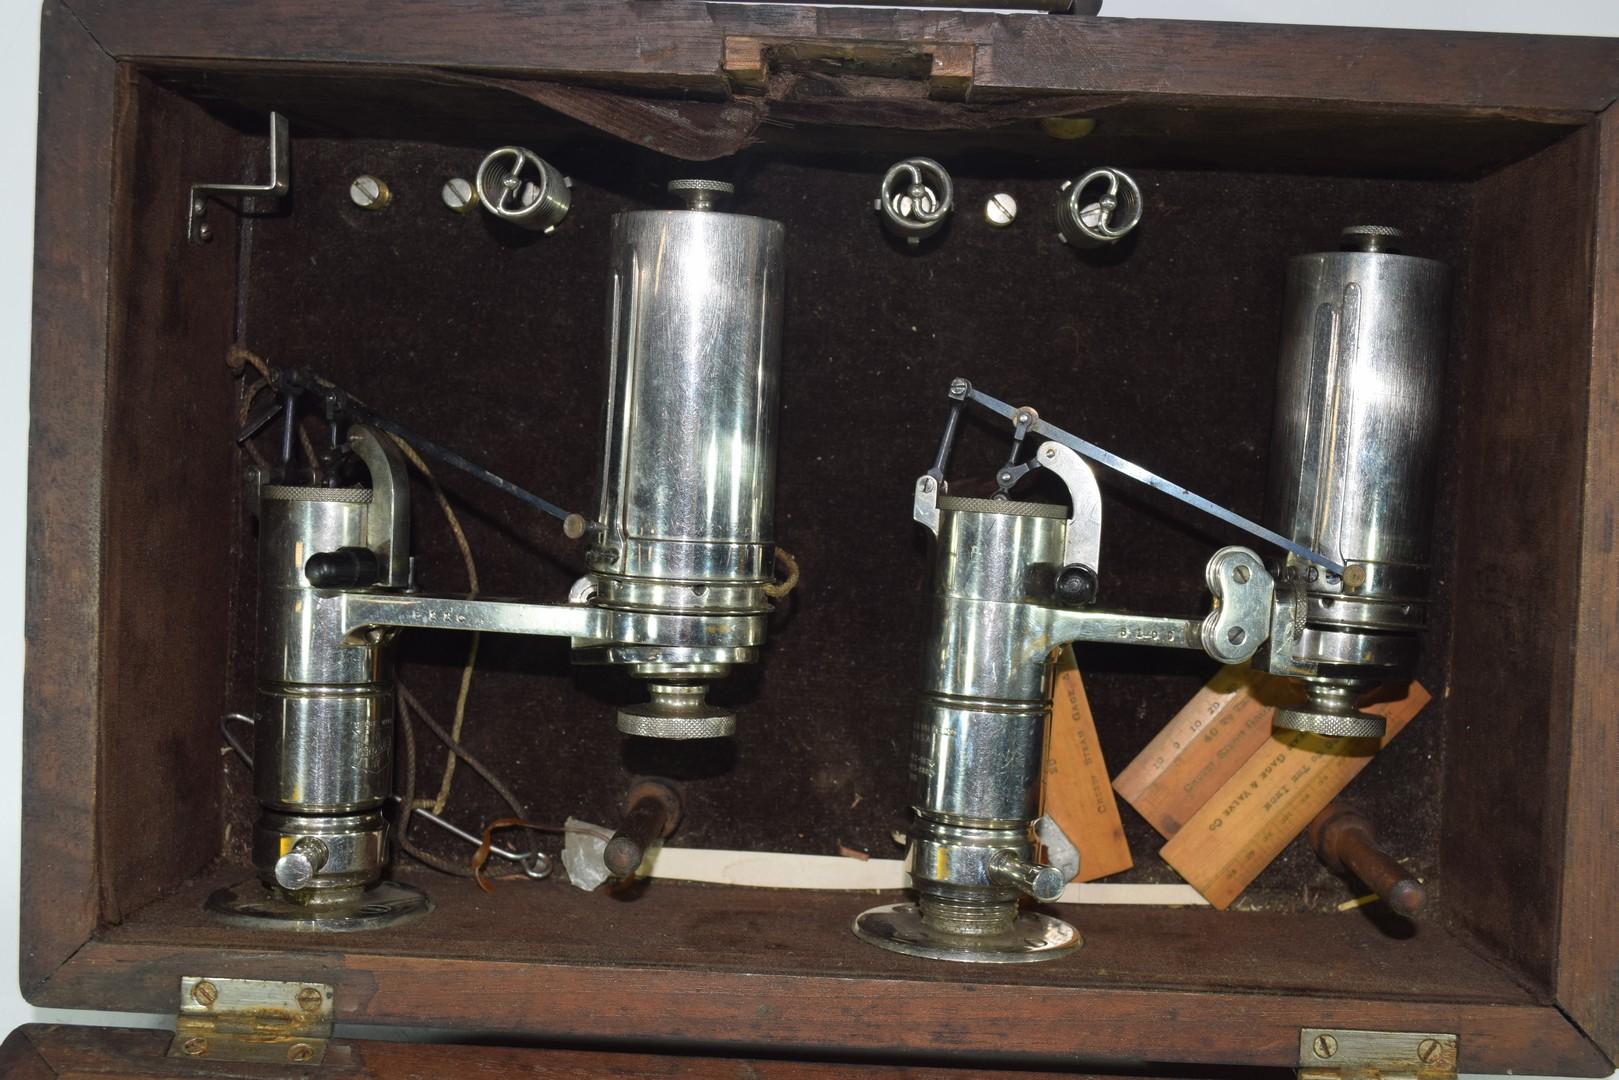 Crosby Steam Gauge and Valve Co of Boston, Massachusetts, hardwood cased steam engine indicator - Image 3 of 3